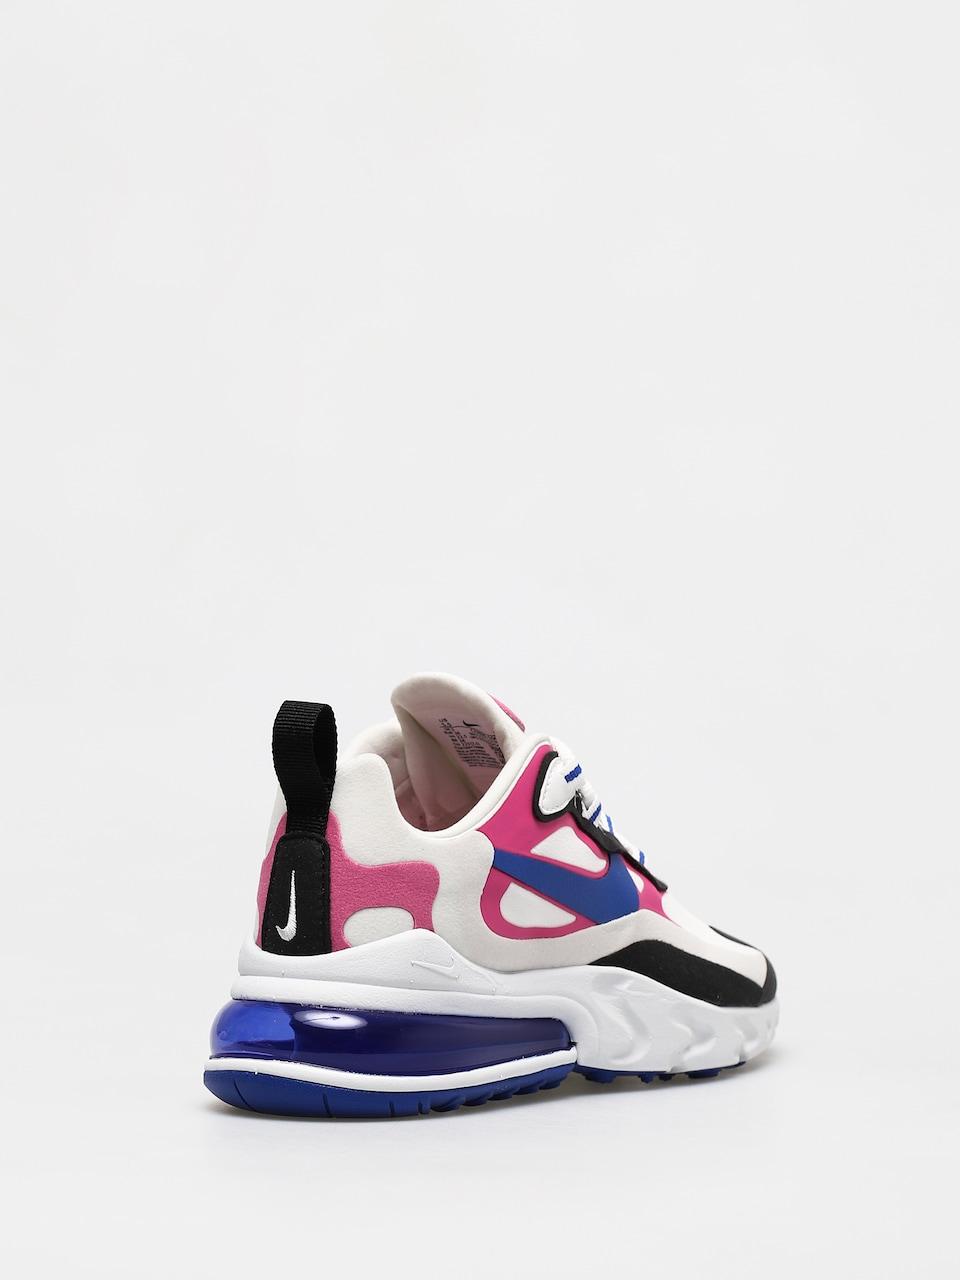 Buty Nike Air Max 270 React Wmn (summit whitehyper blue cosmic fuchsia)